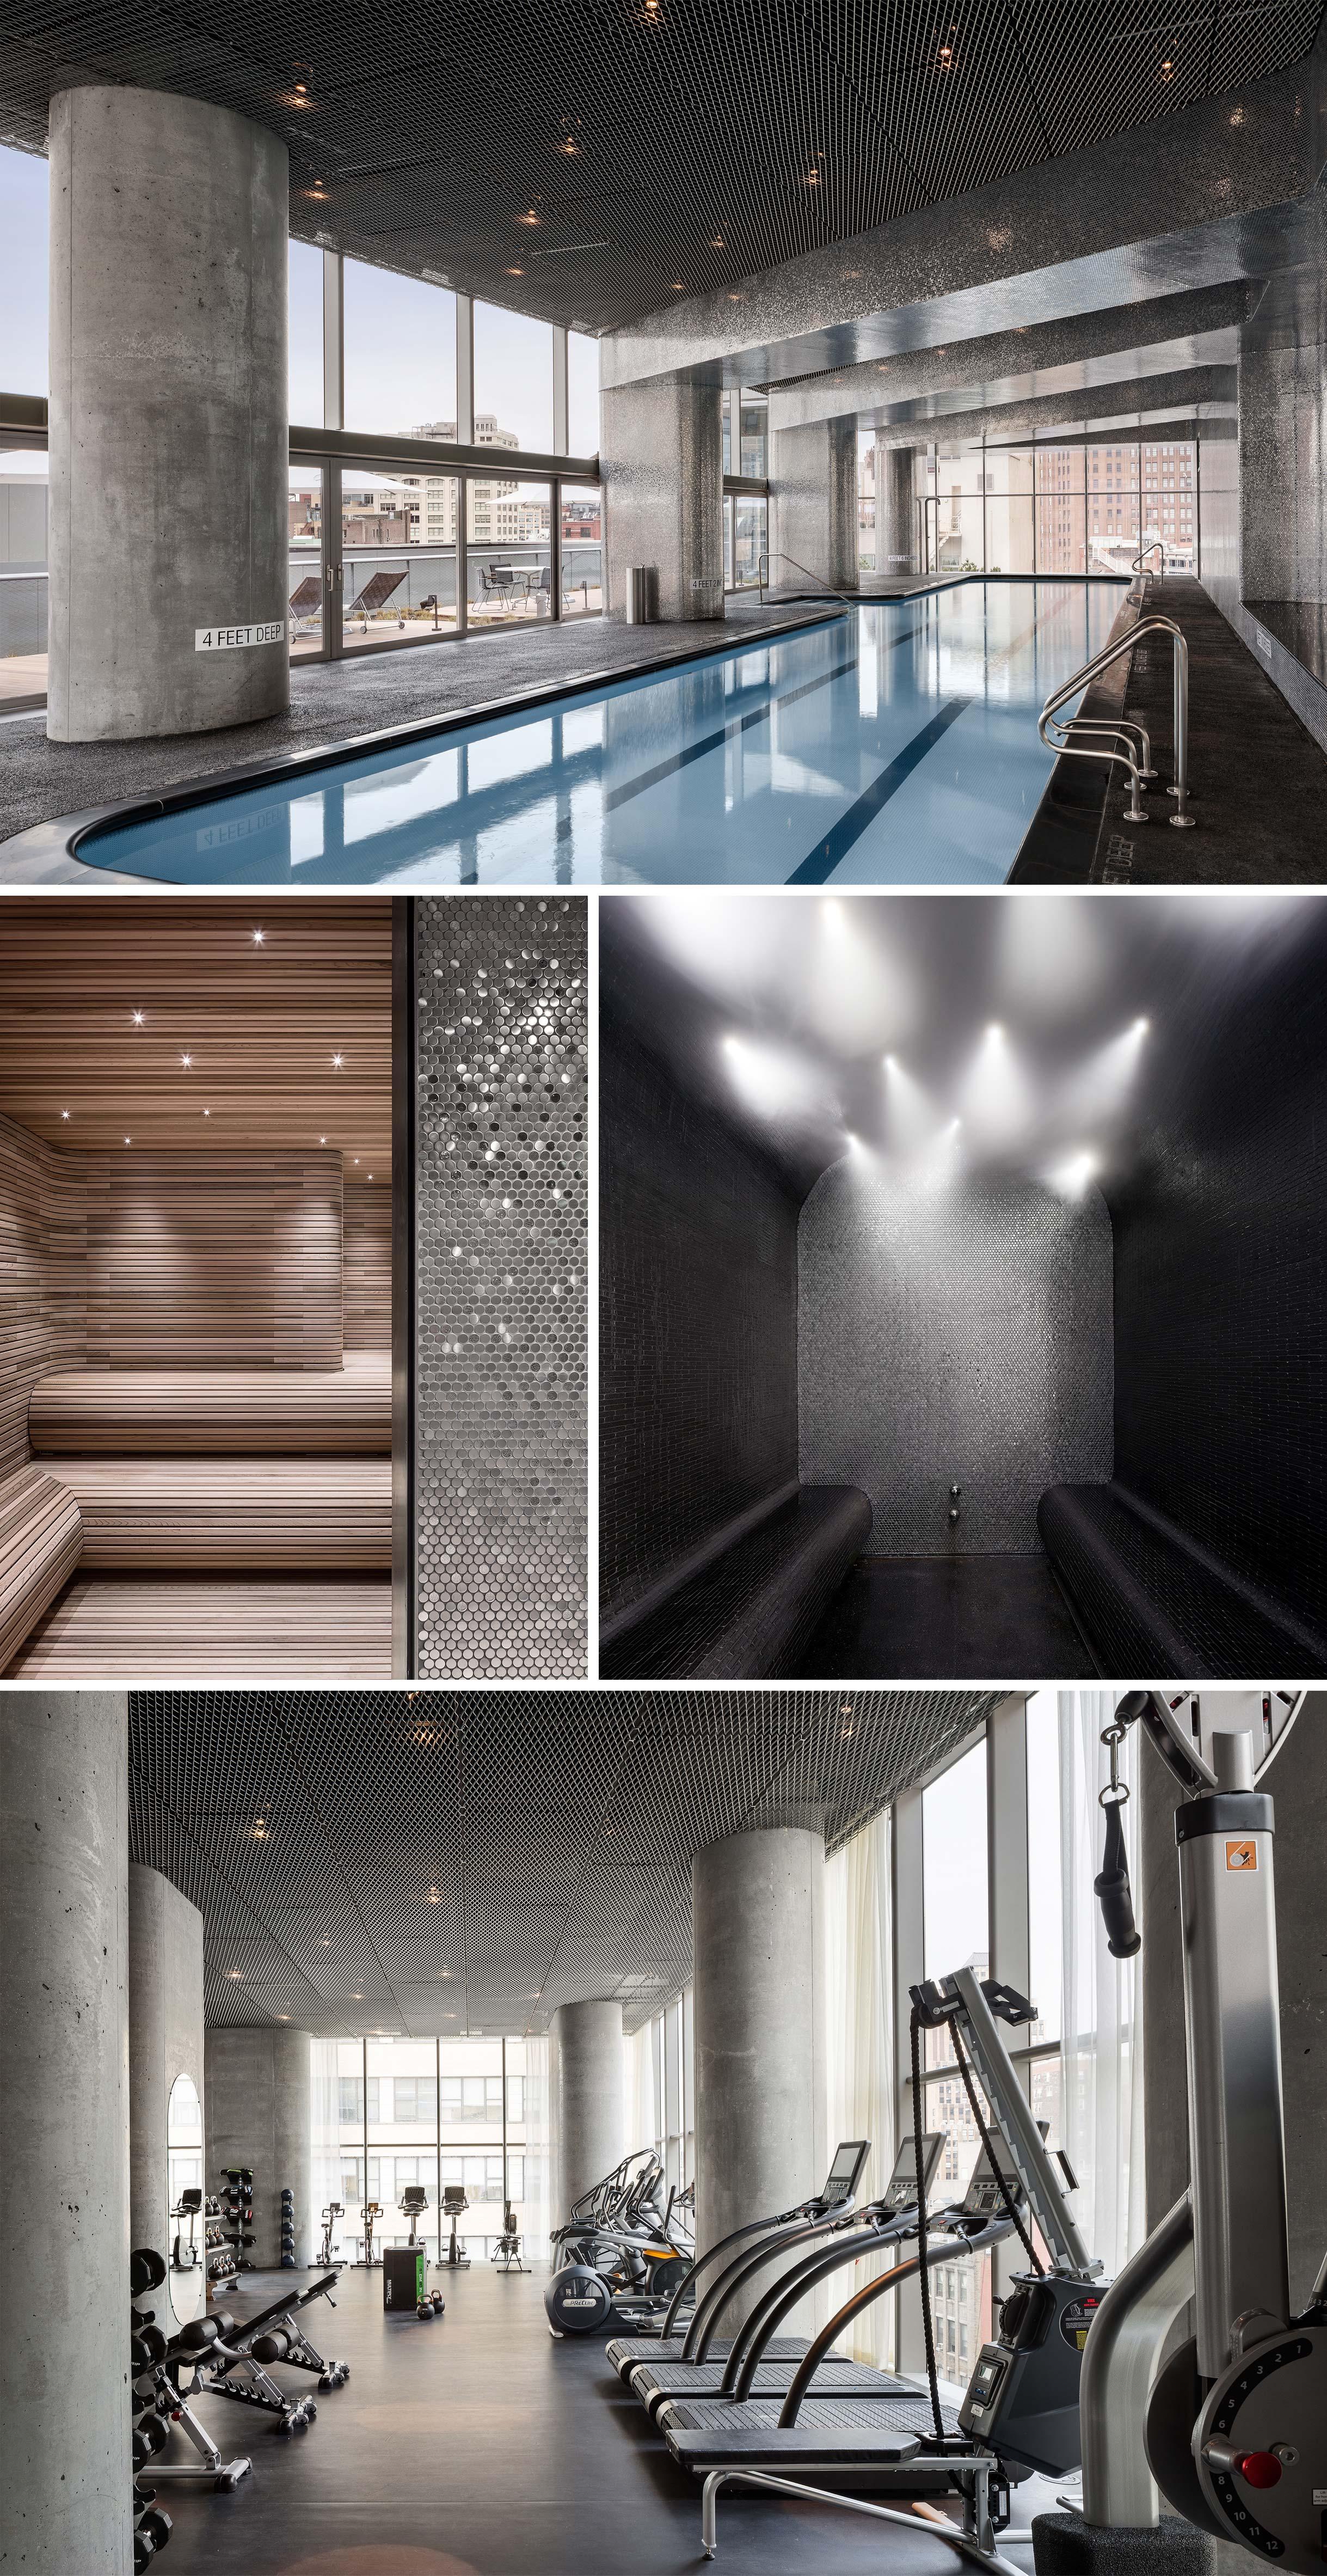 Luxury Amenities in TriBeCa Condos: Lap Pool, Steam Room, Sauna, Gym